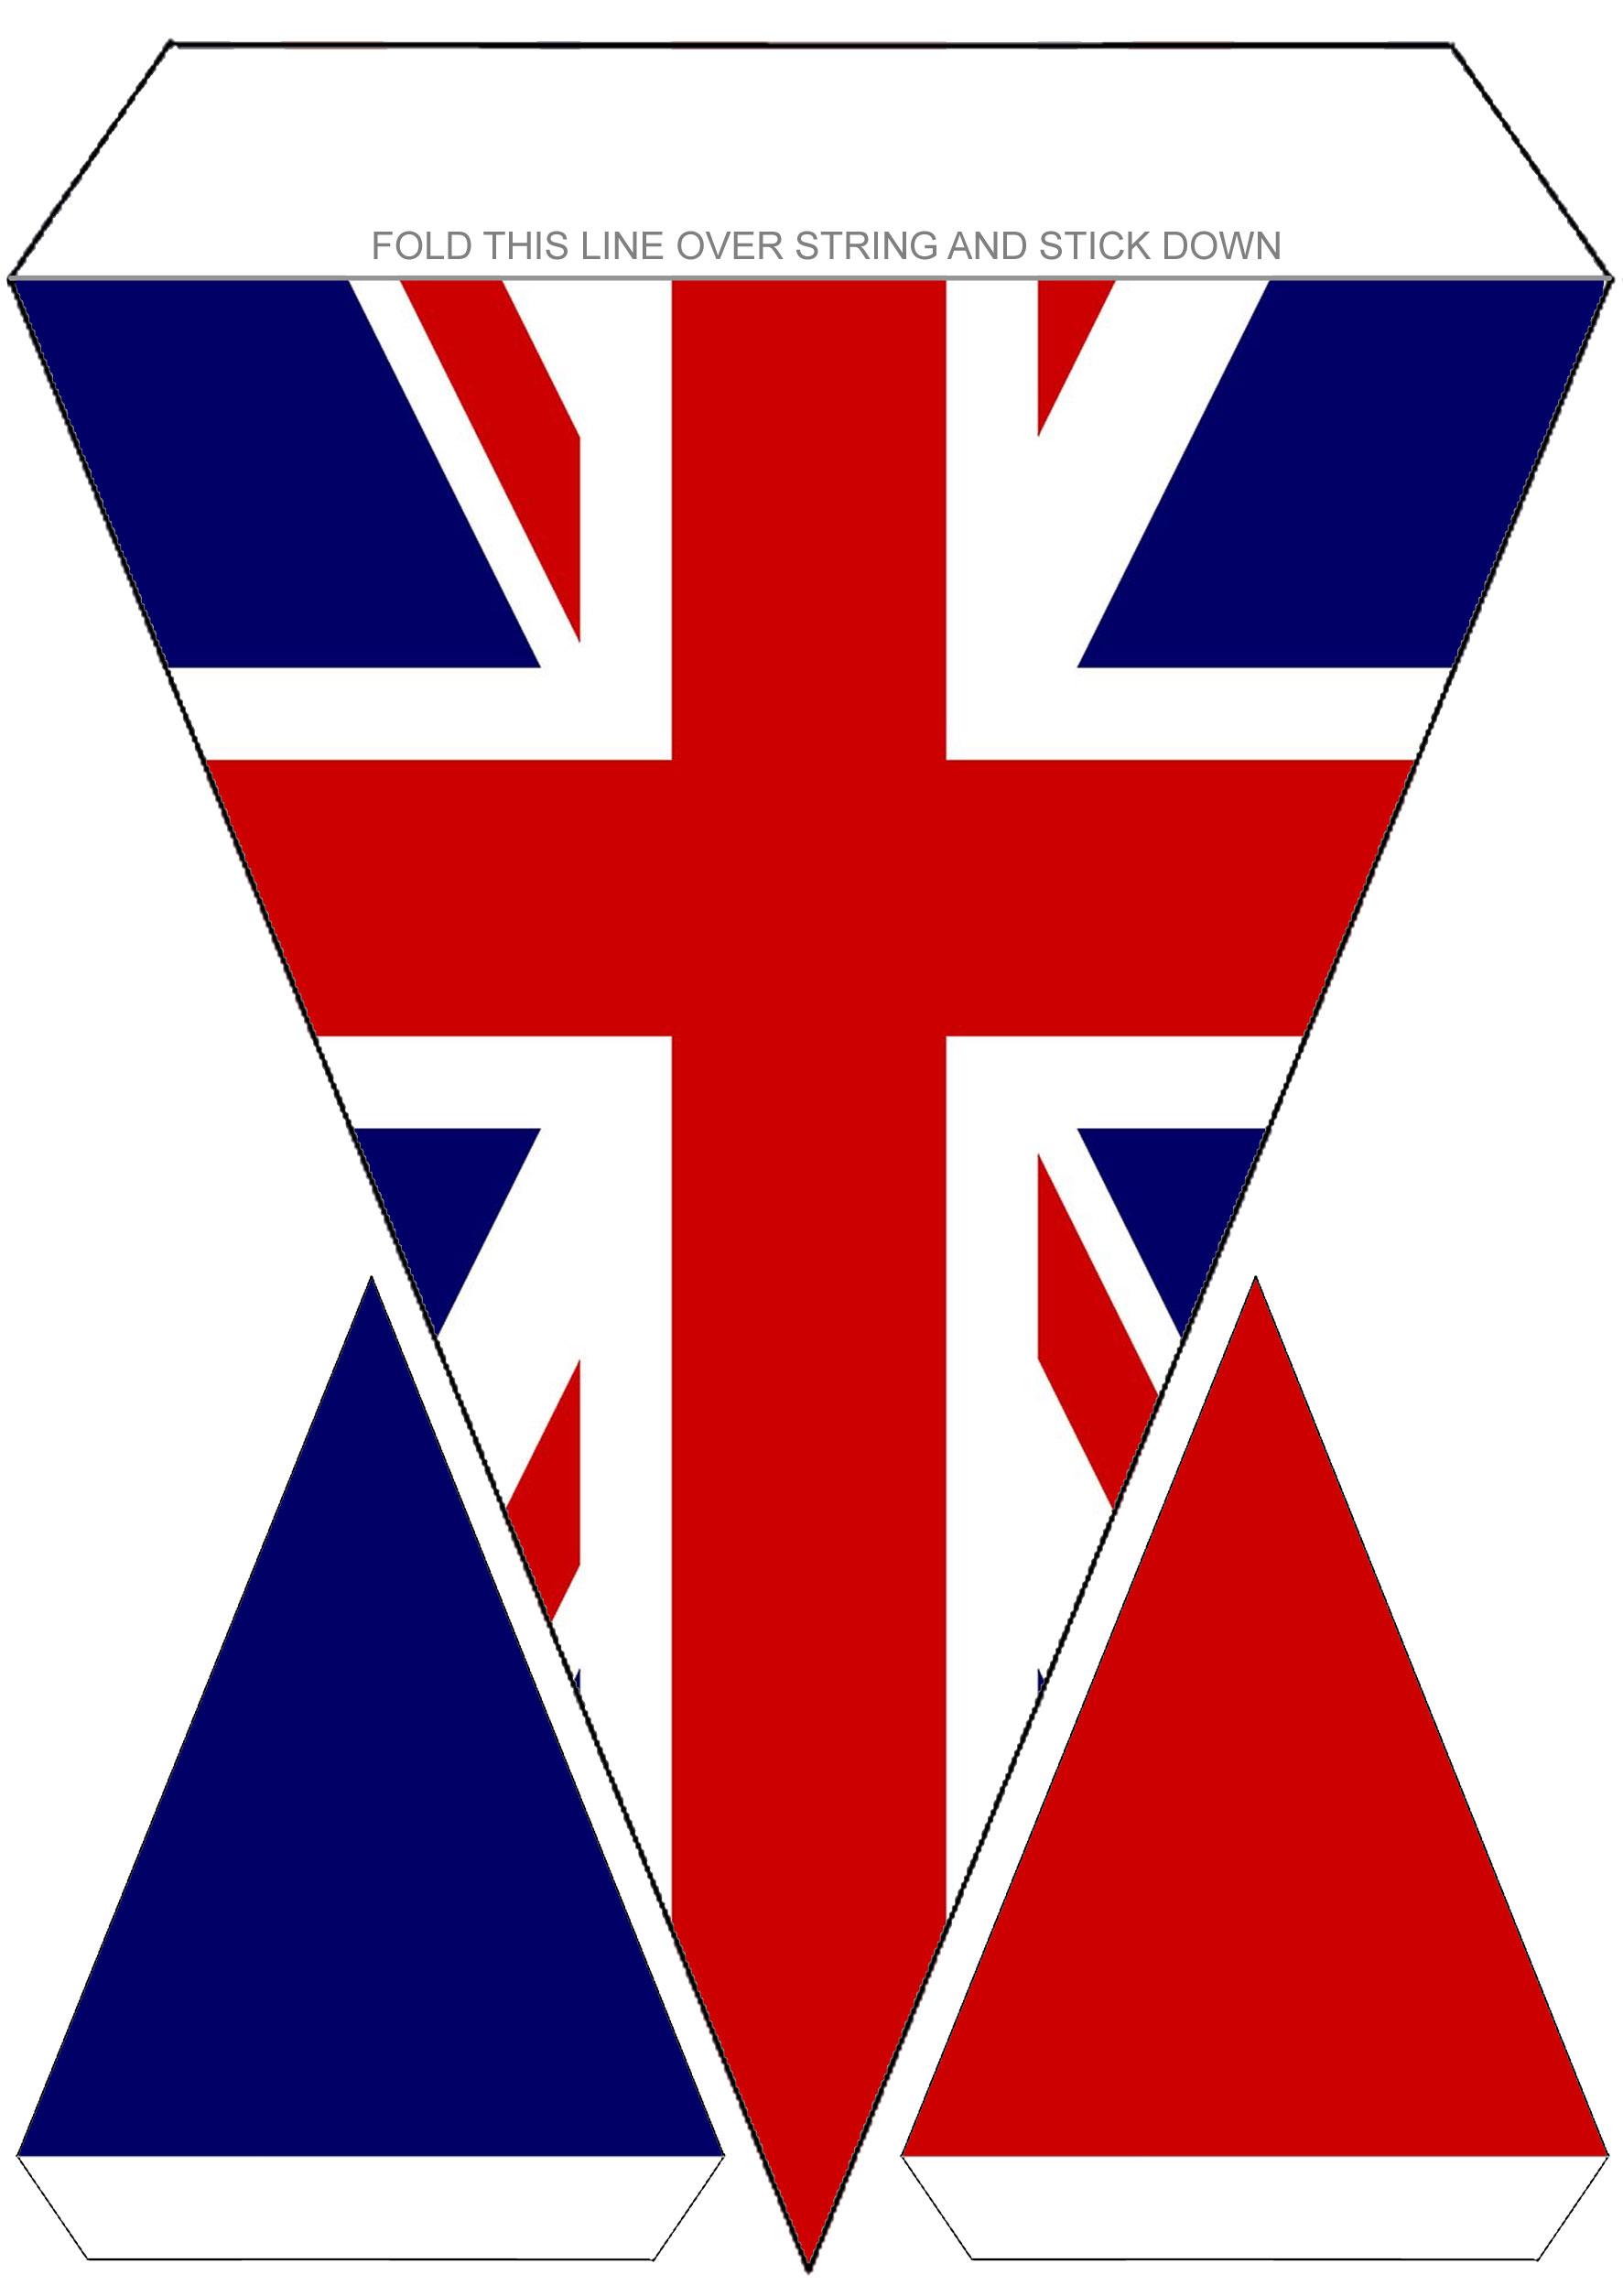 Printable Union Jack flag bunting for VE Day amd other British celebrations